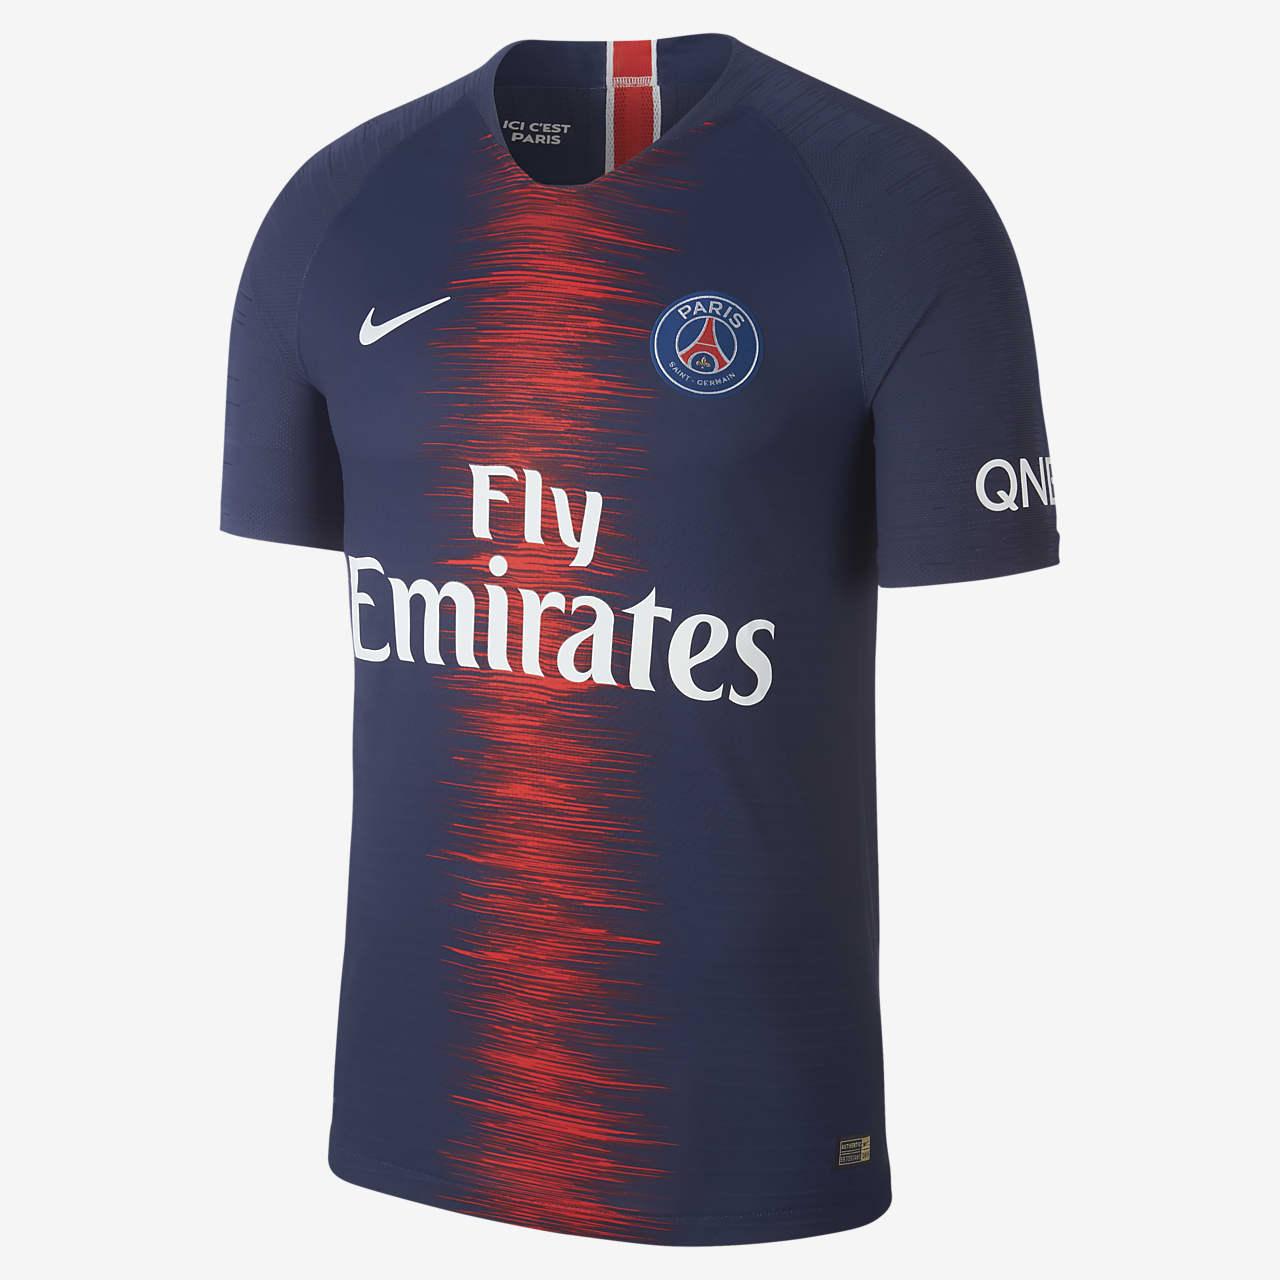 Camiseta de fútbol para hombre de local Vapor Match del Paris Saint-Germain 2018/19